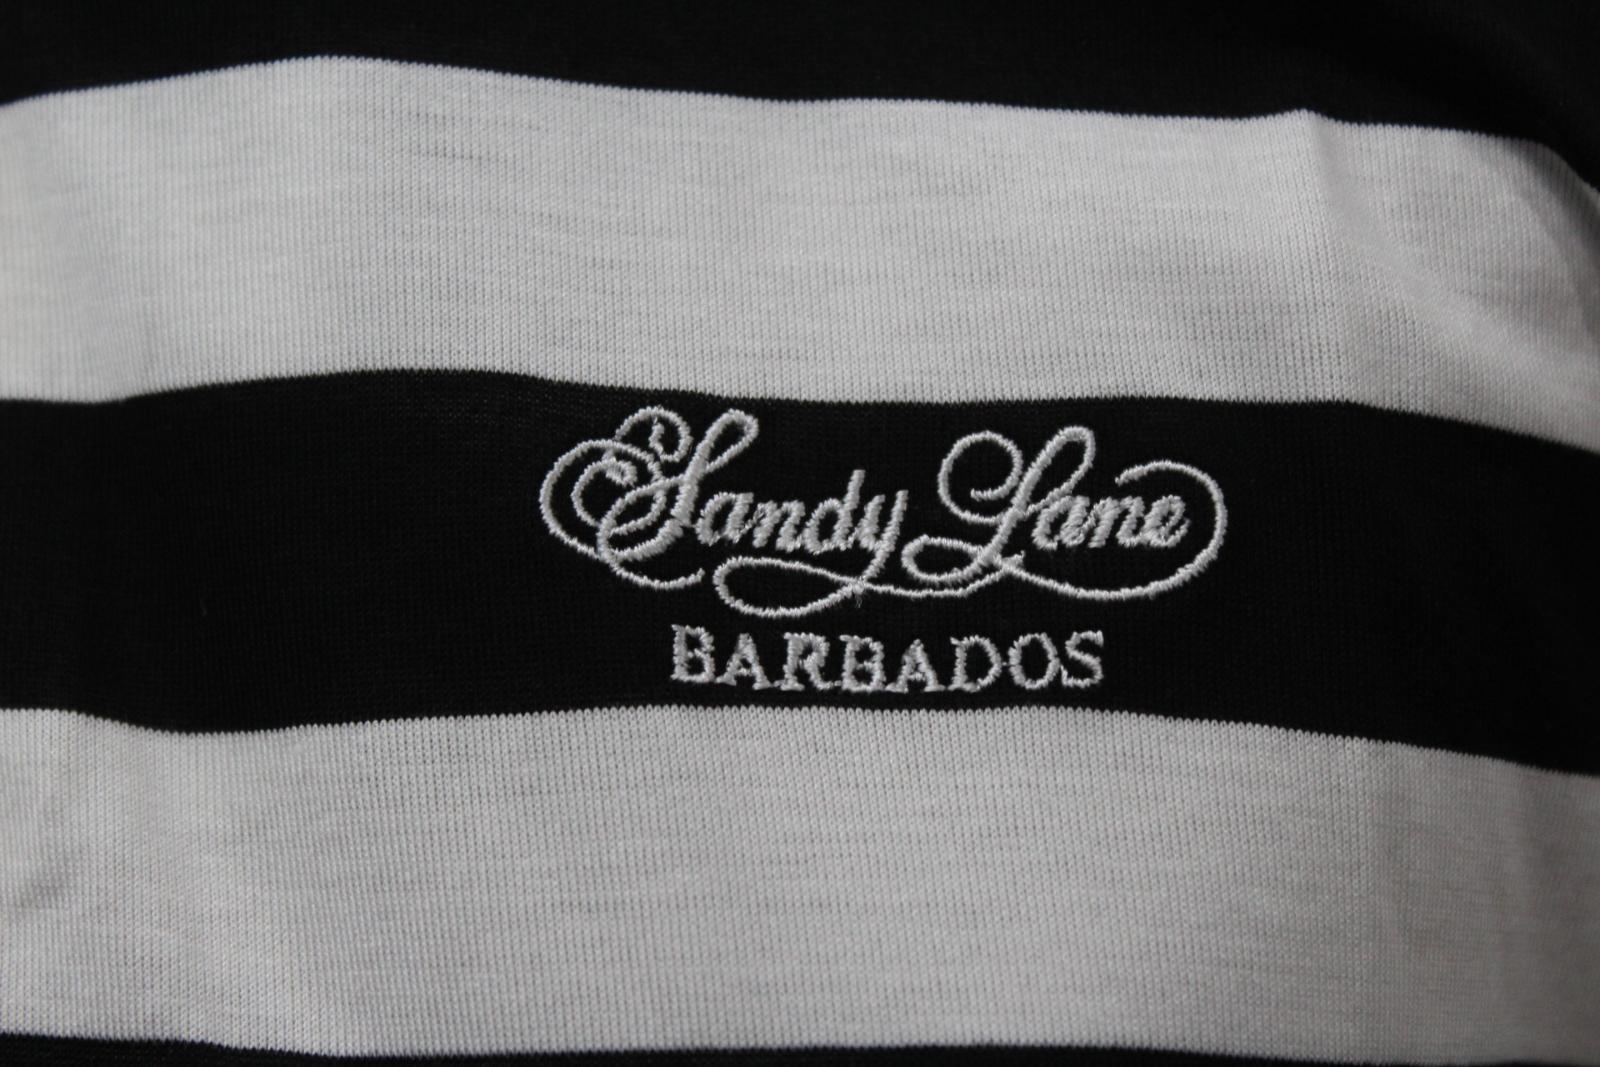 BURBERRY-GOLF-Ladies-Black-White-Cotton-Short-Sleeve-Striped-Polo-Shirt-S-BNWT thumbnail 8